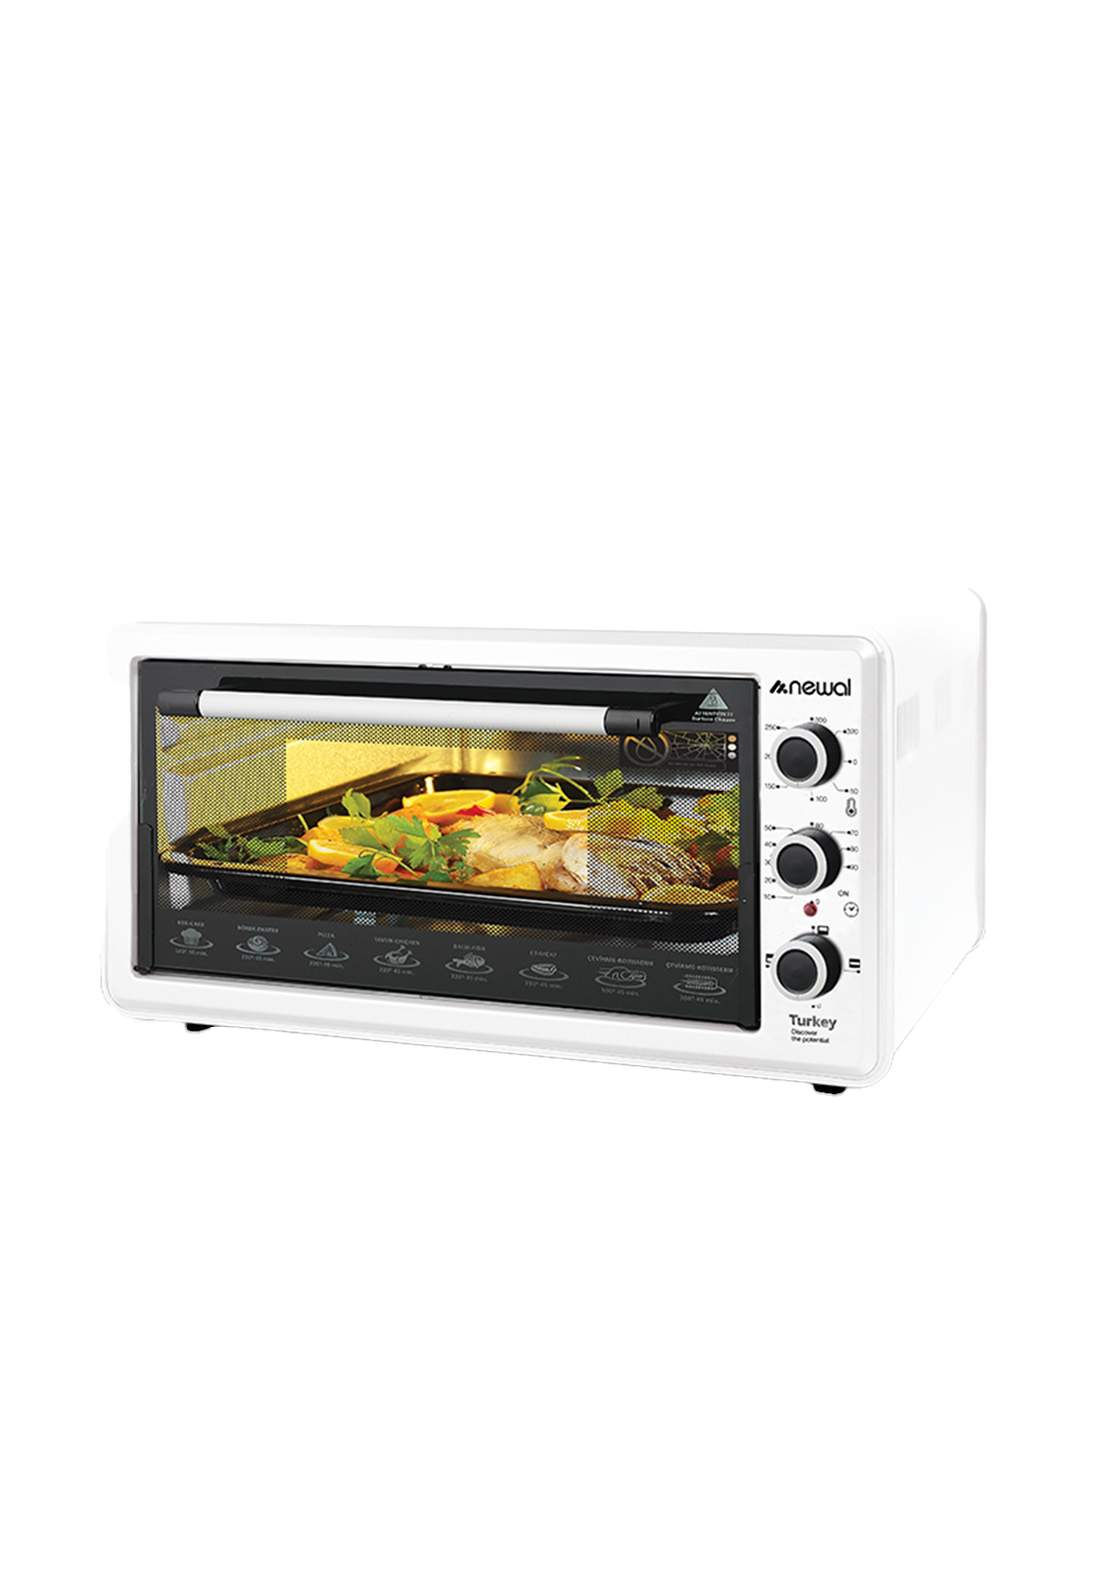 Newal Mini Oven 45L MOV-451-01 - White فرن كهربائي